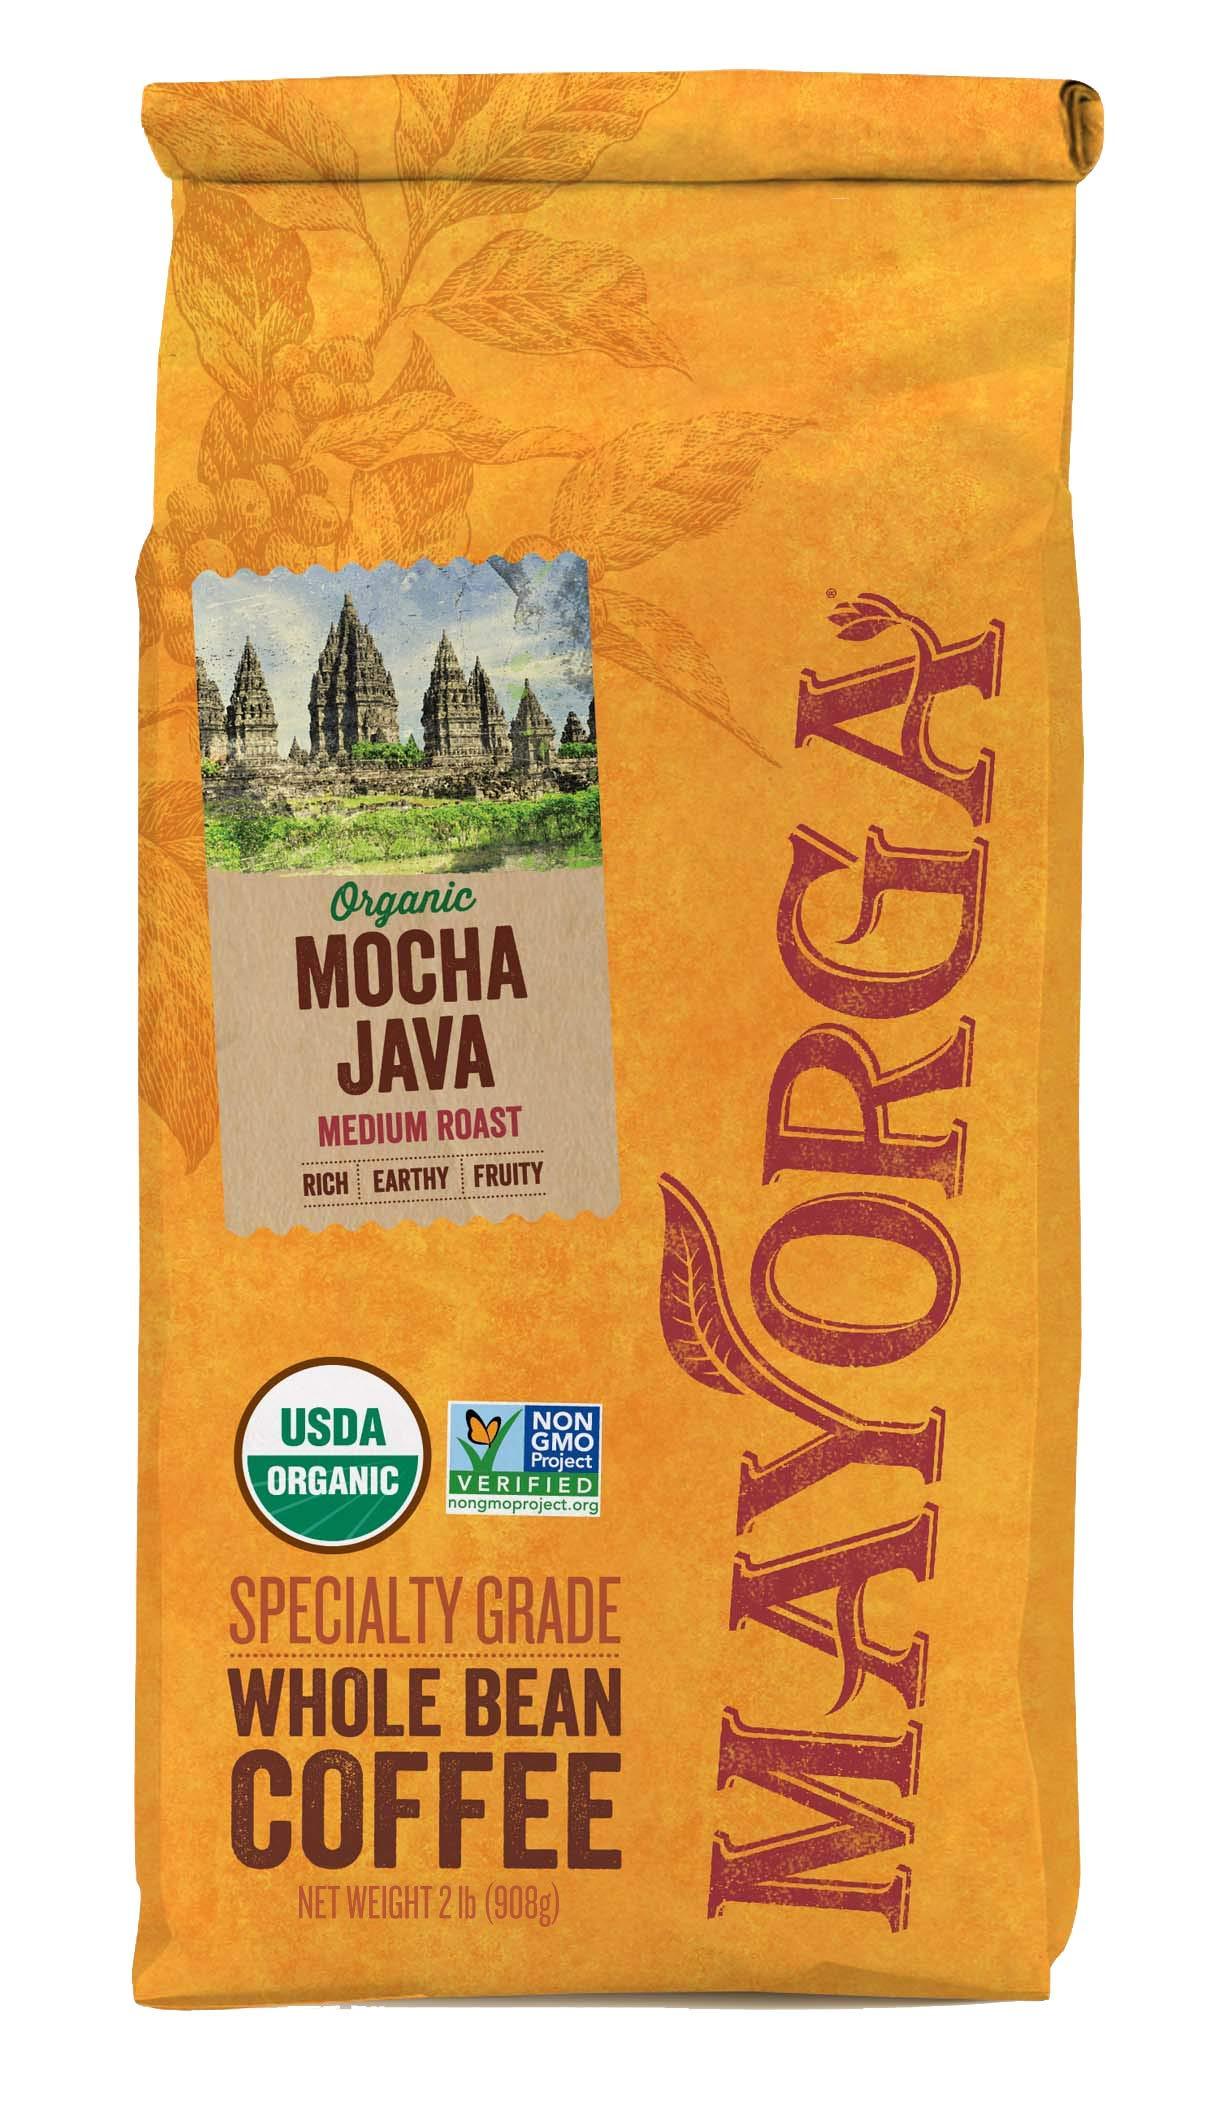 Mocha Java, 2LB, Mayorga Organics, Whole Bean Coffee, Medium Roast, 100% USDA Organic Certified